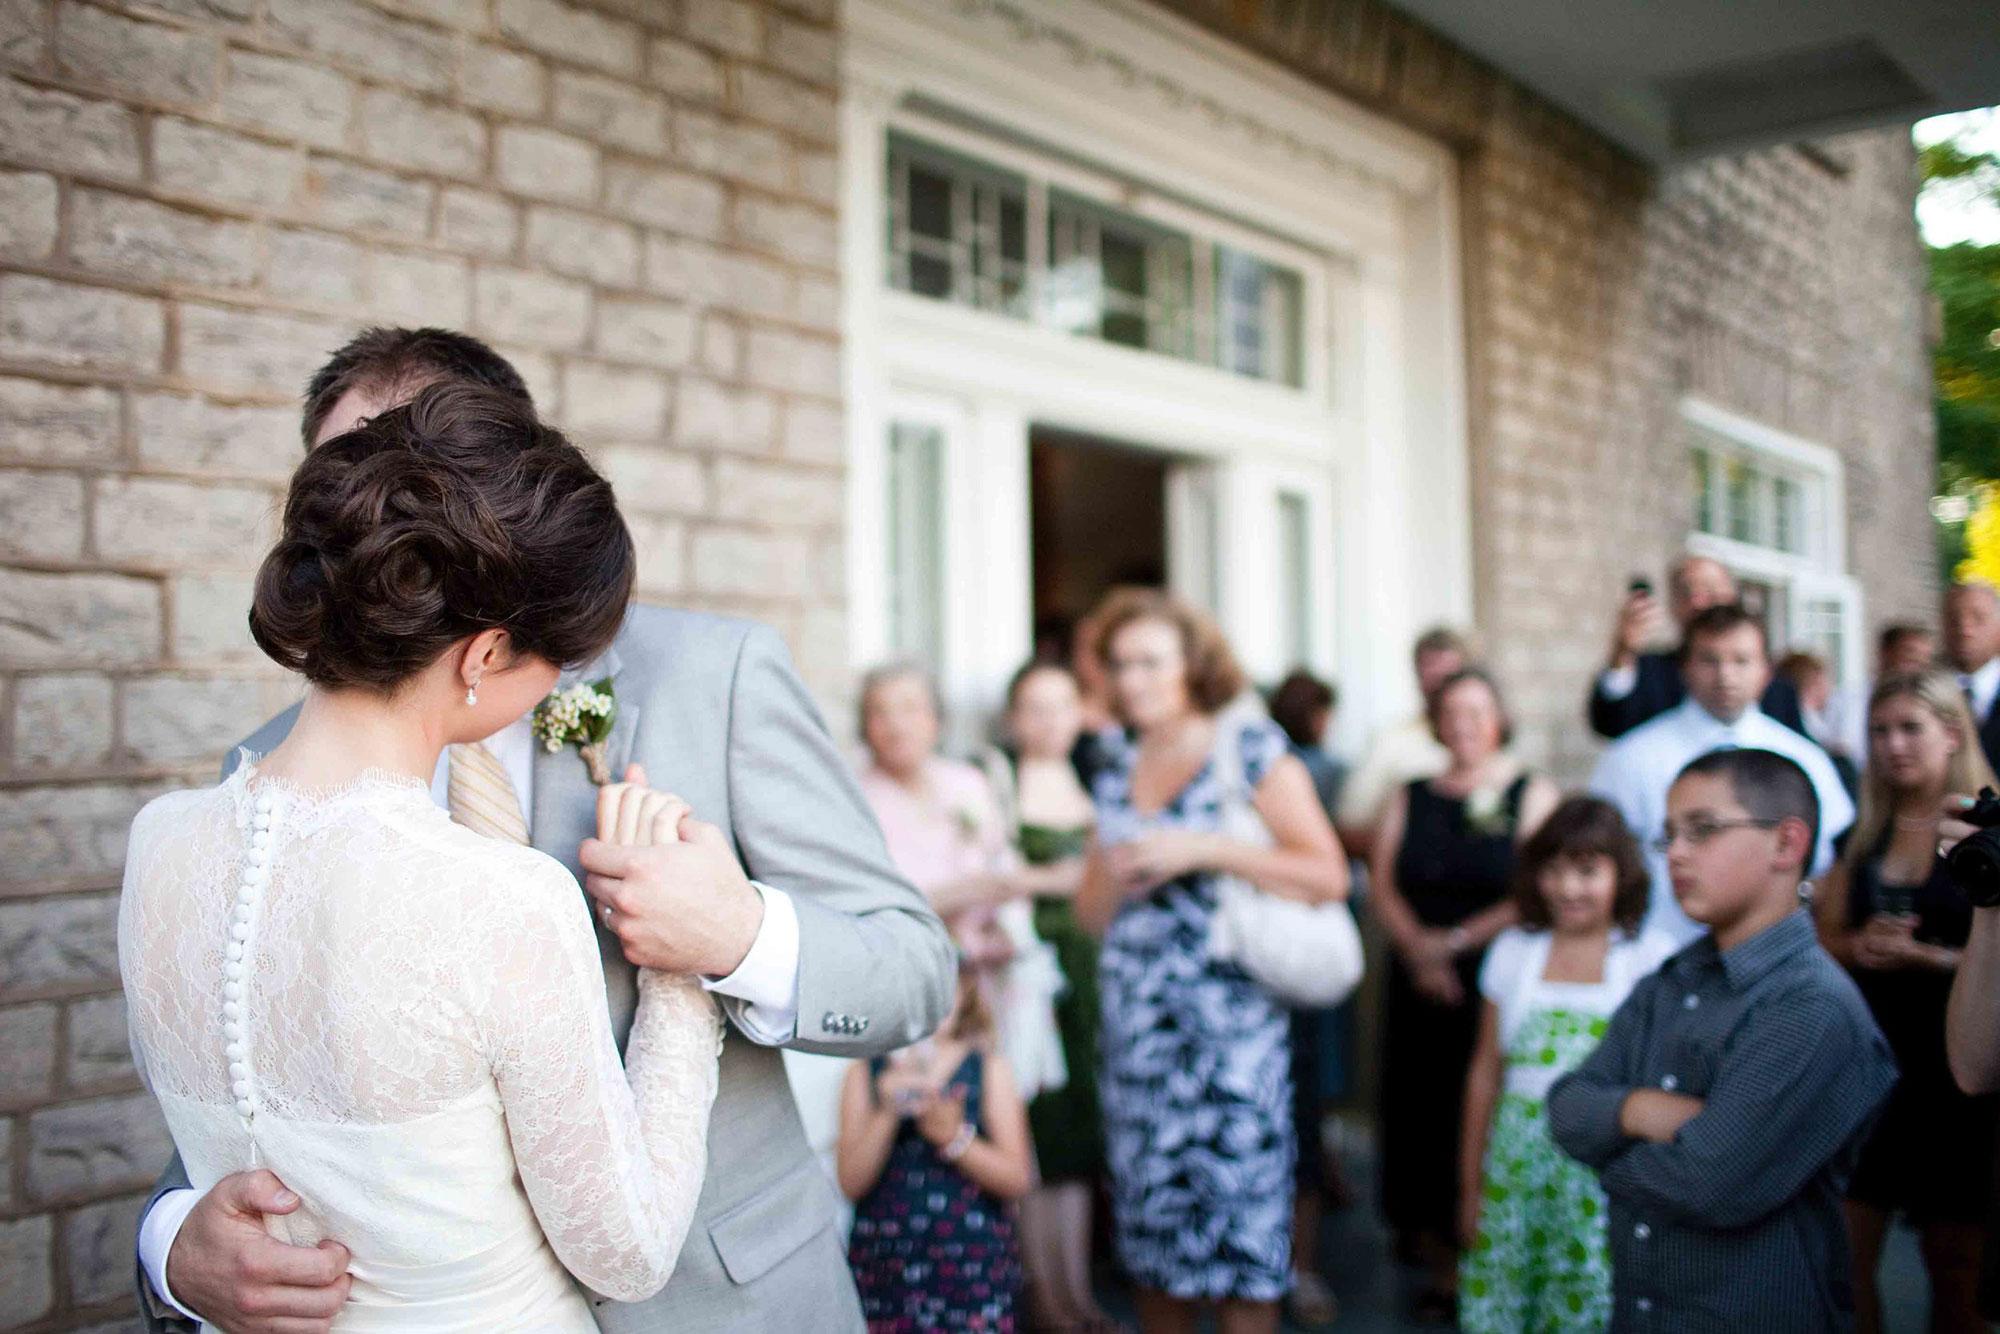 Amanda-Cowley-Willowbank-Vineyard-Bride-Photo-By-White-Photographie-044.jpg